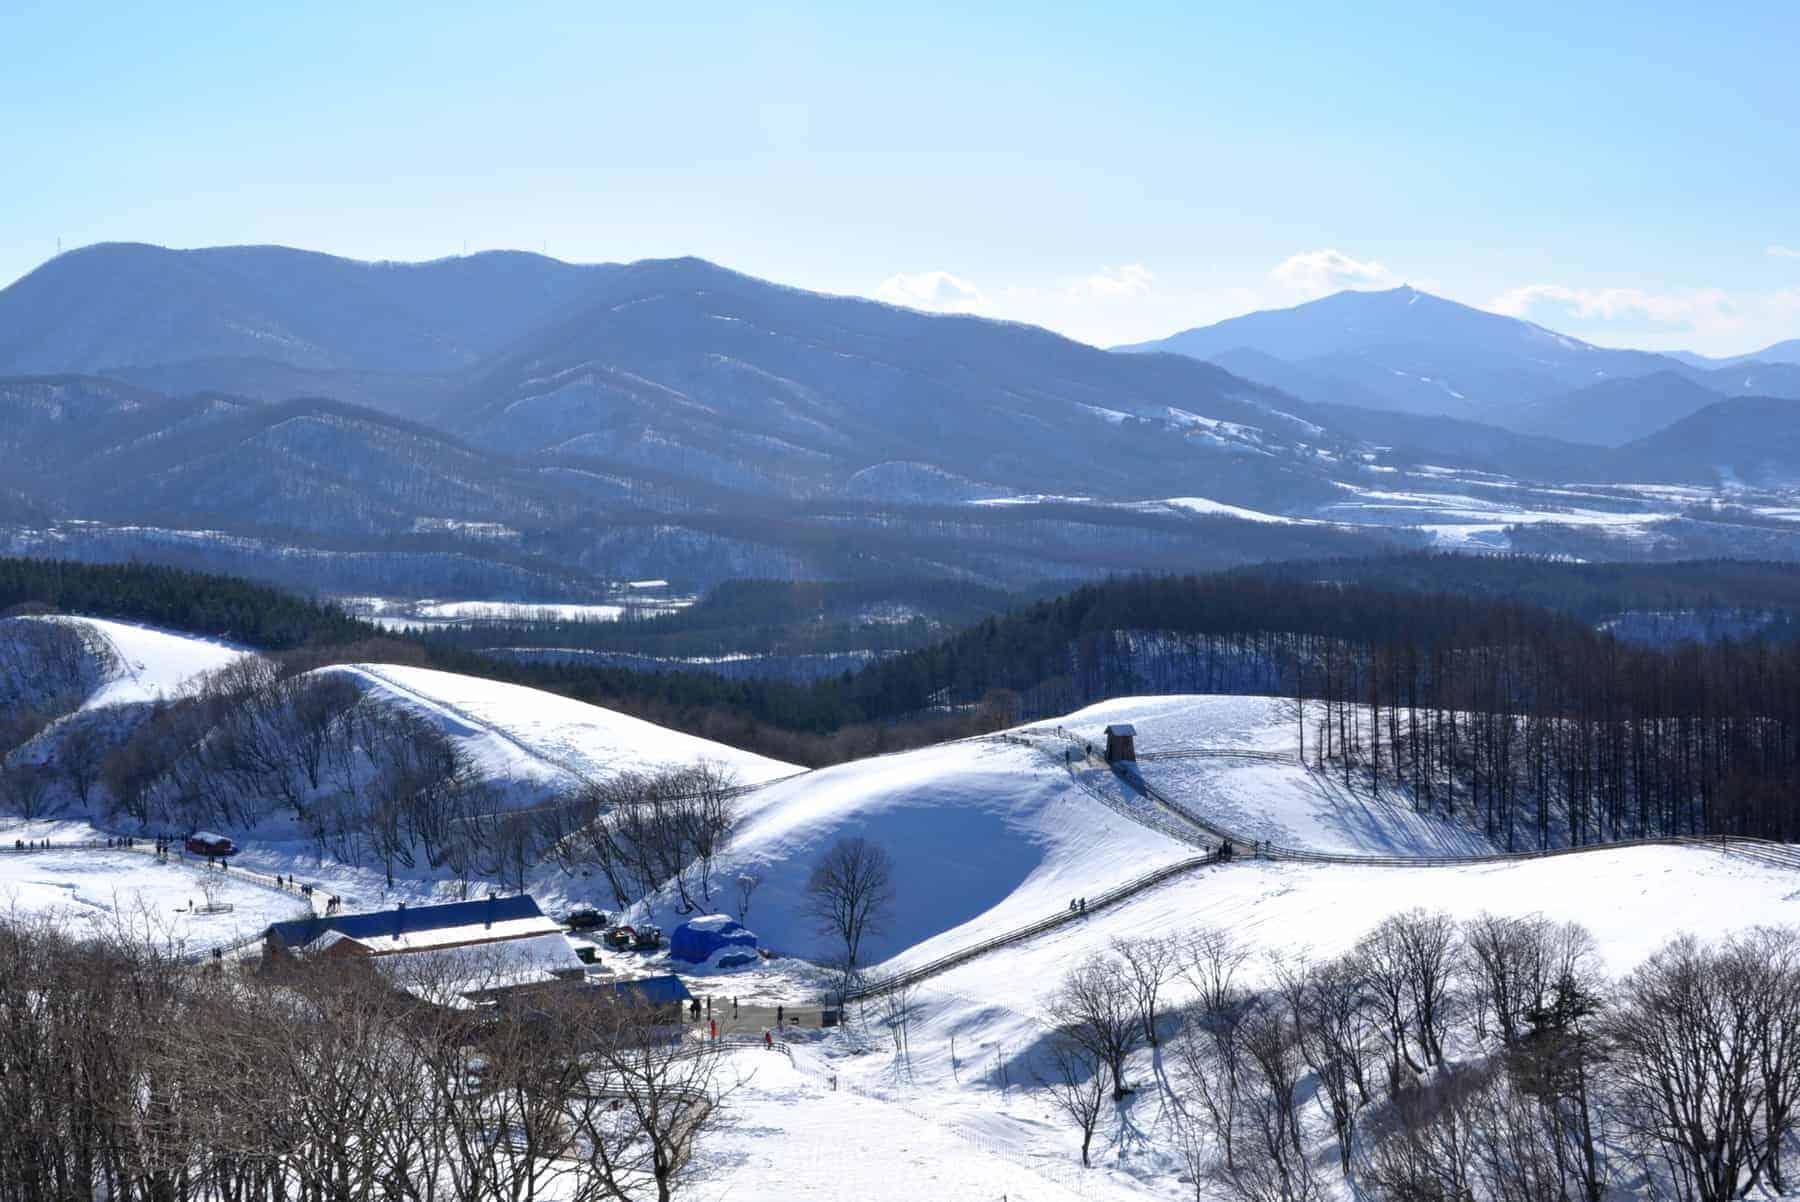 Snowy mountains in South Korea